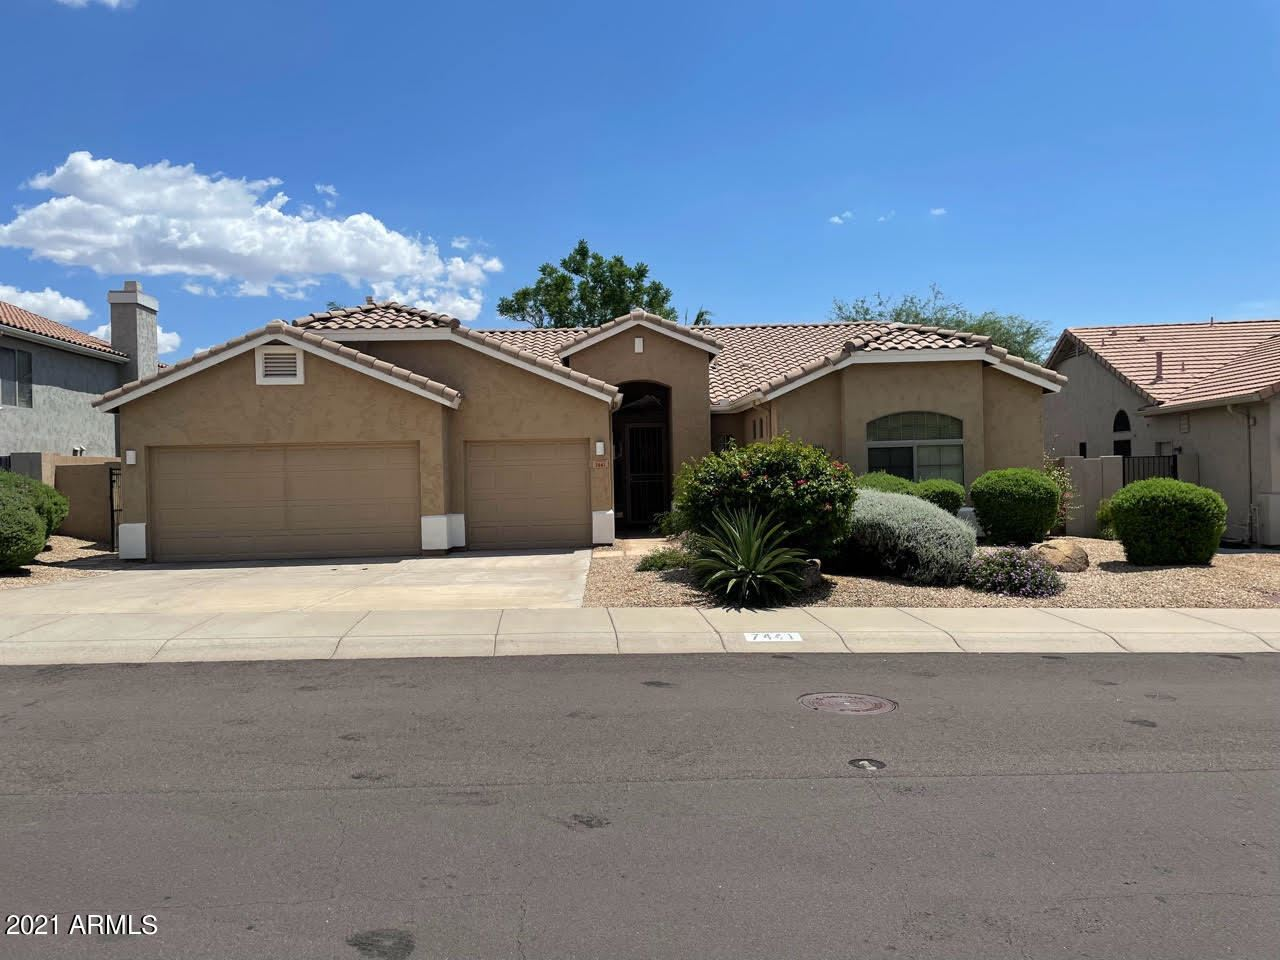 Photo of 7441 E GLENN MOORE Road, Scottsdale, AZ 85255 (MLS # 6272514)